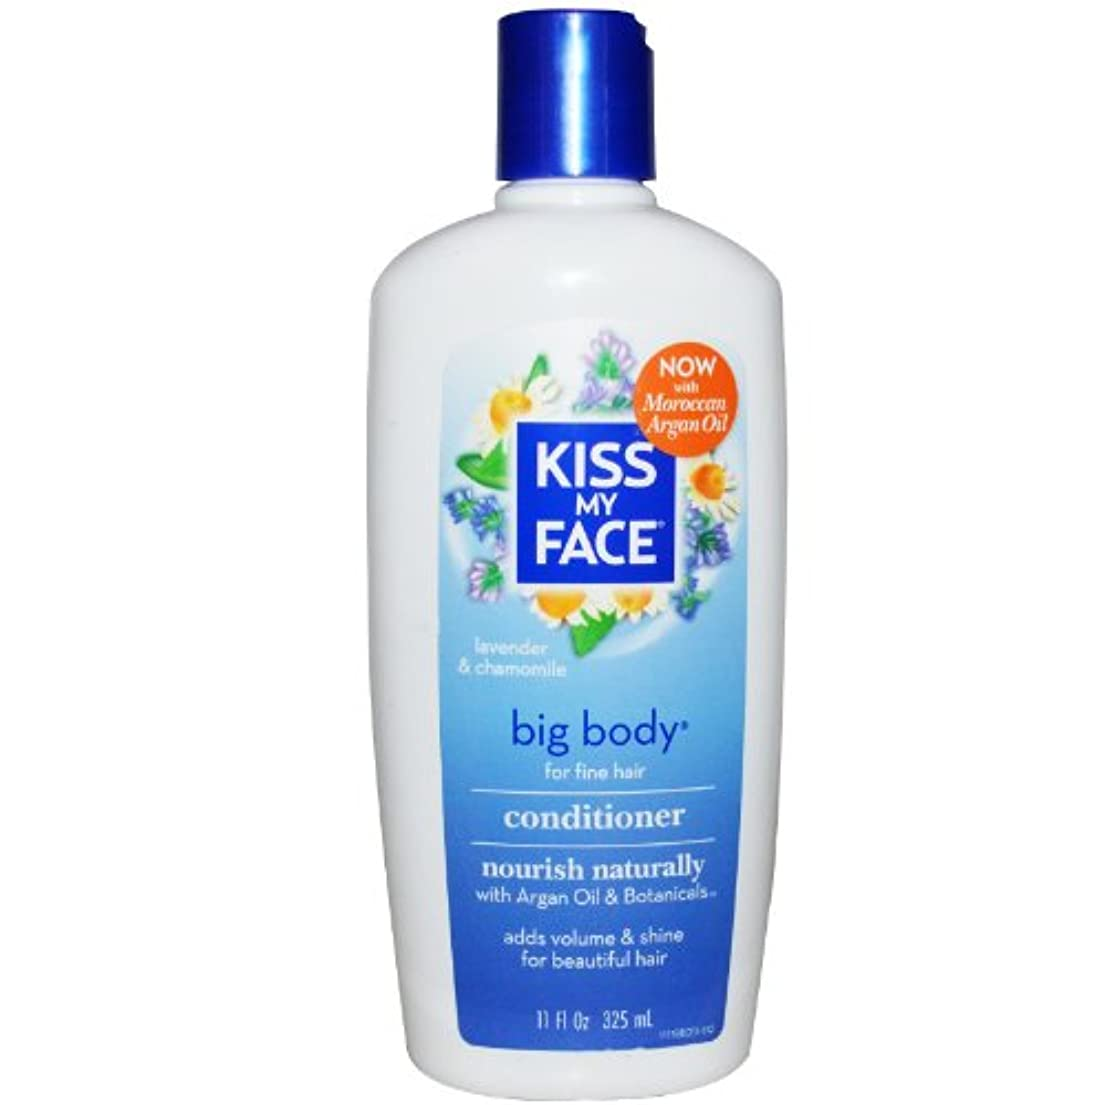 Kiss My Face Big Body Conditioner Lavender and Chamomile - 11 fl oz